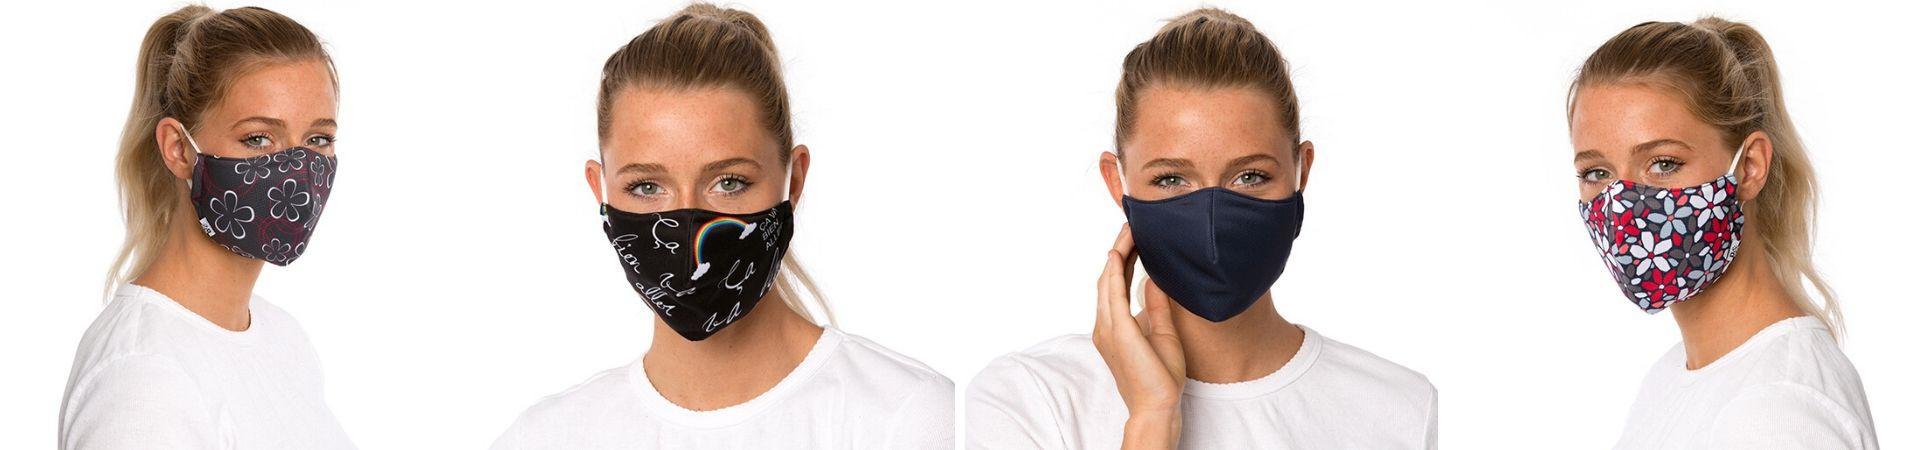 Reusable and antibacterial face masks.